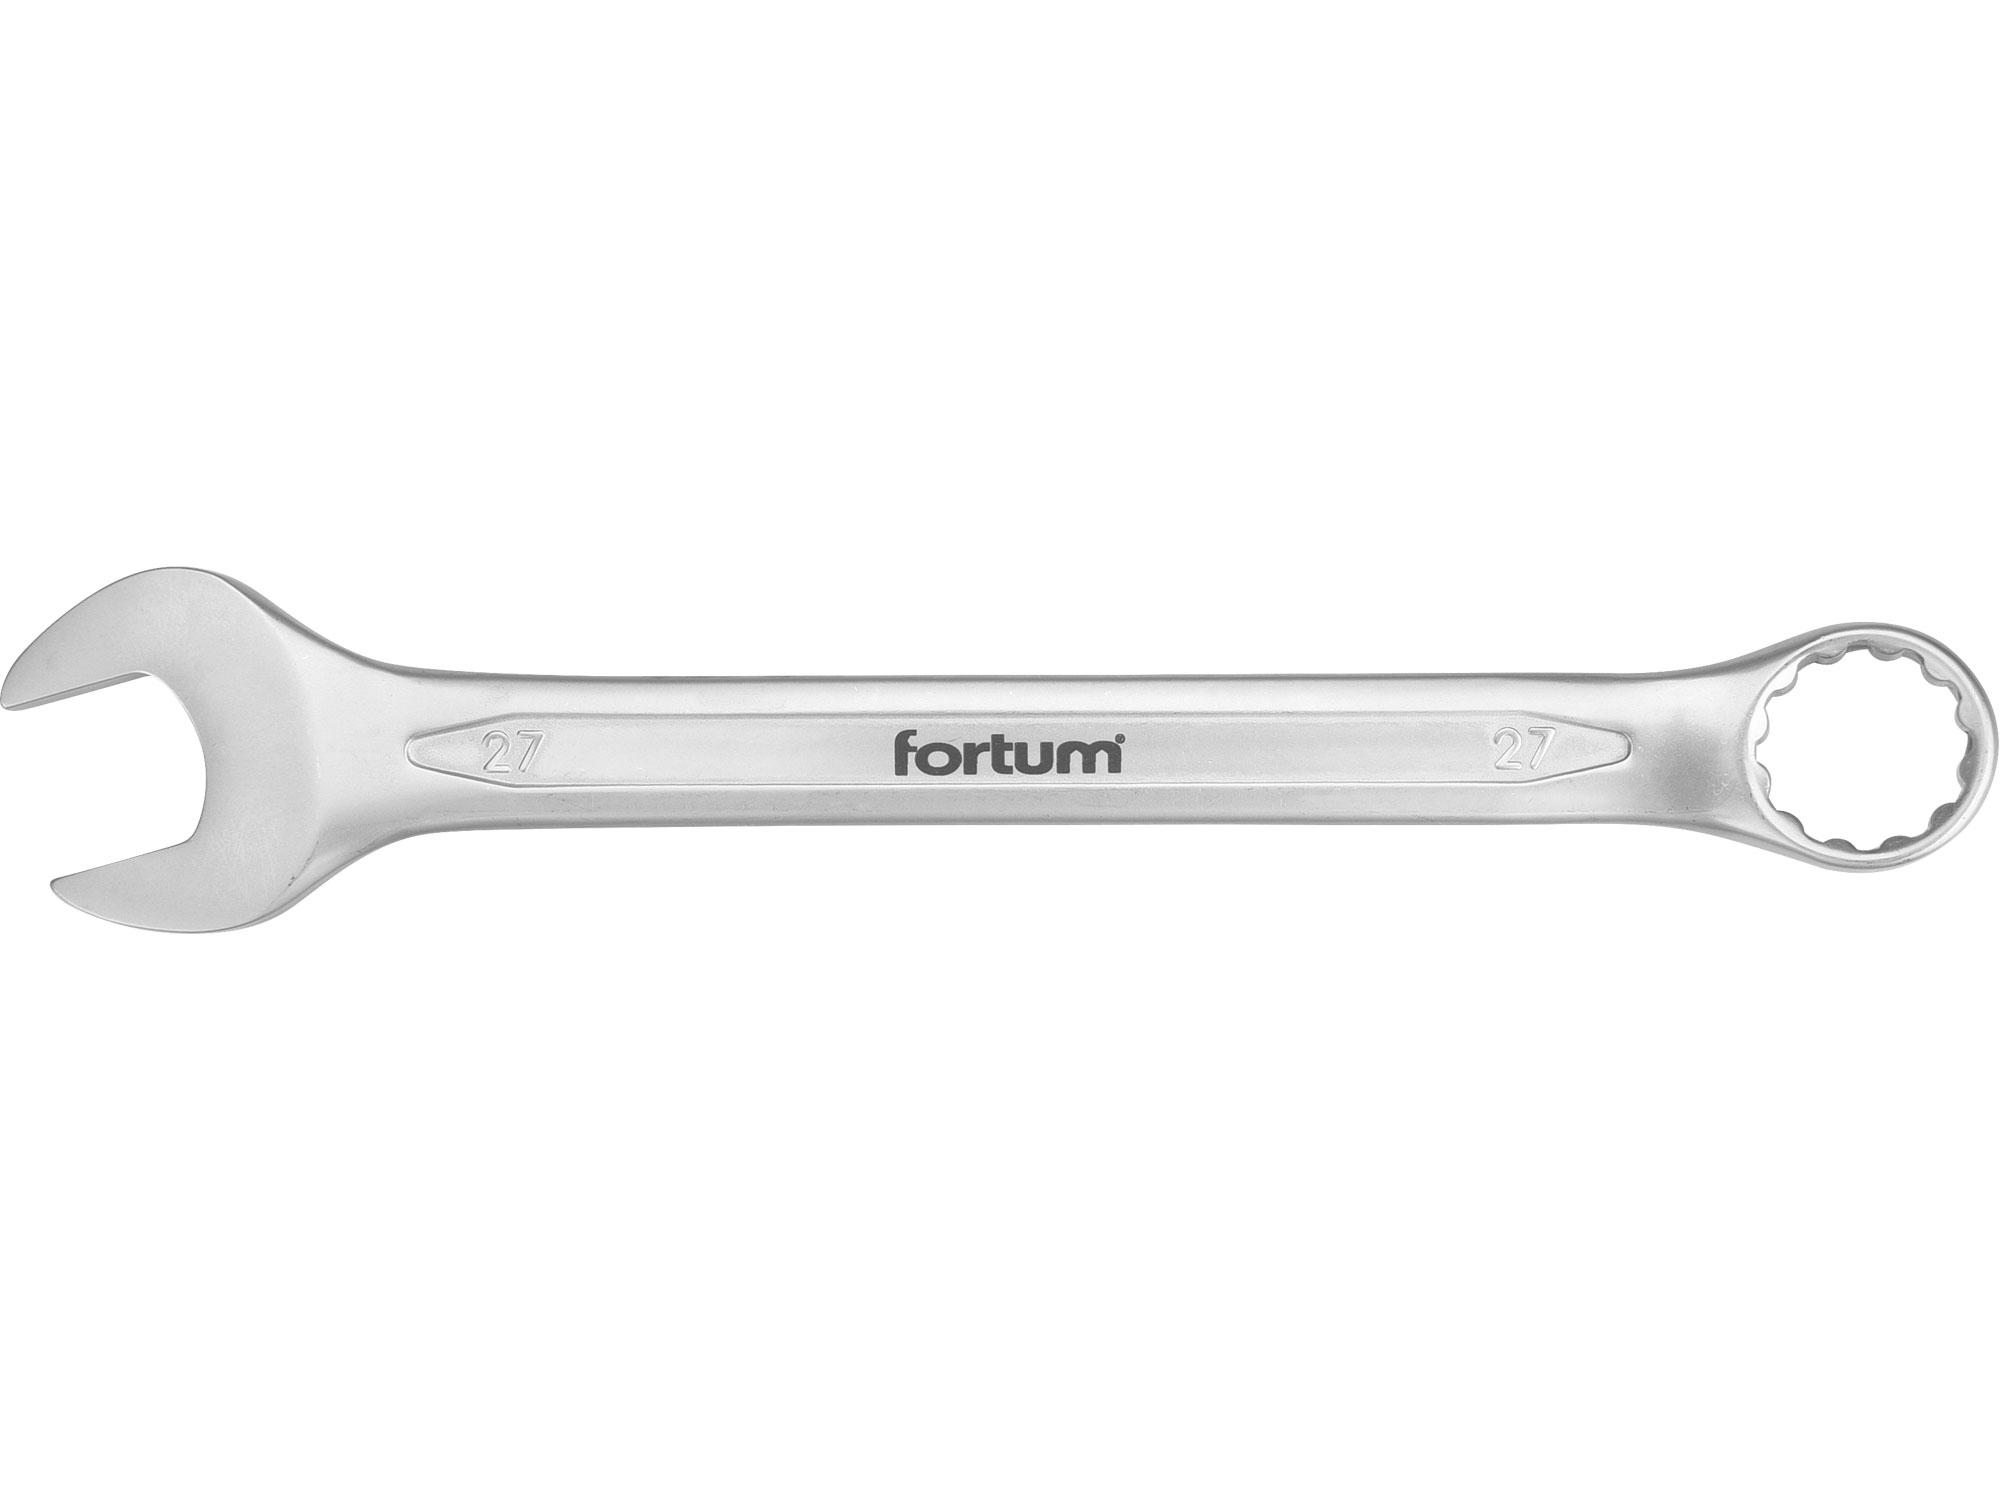 klíč očkoplochý, 27mm, L 323mm, FORTUM 4730227